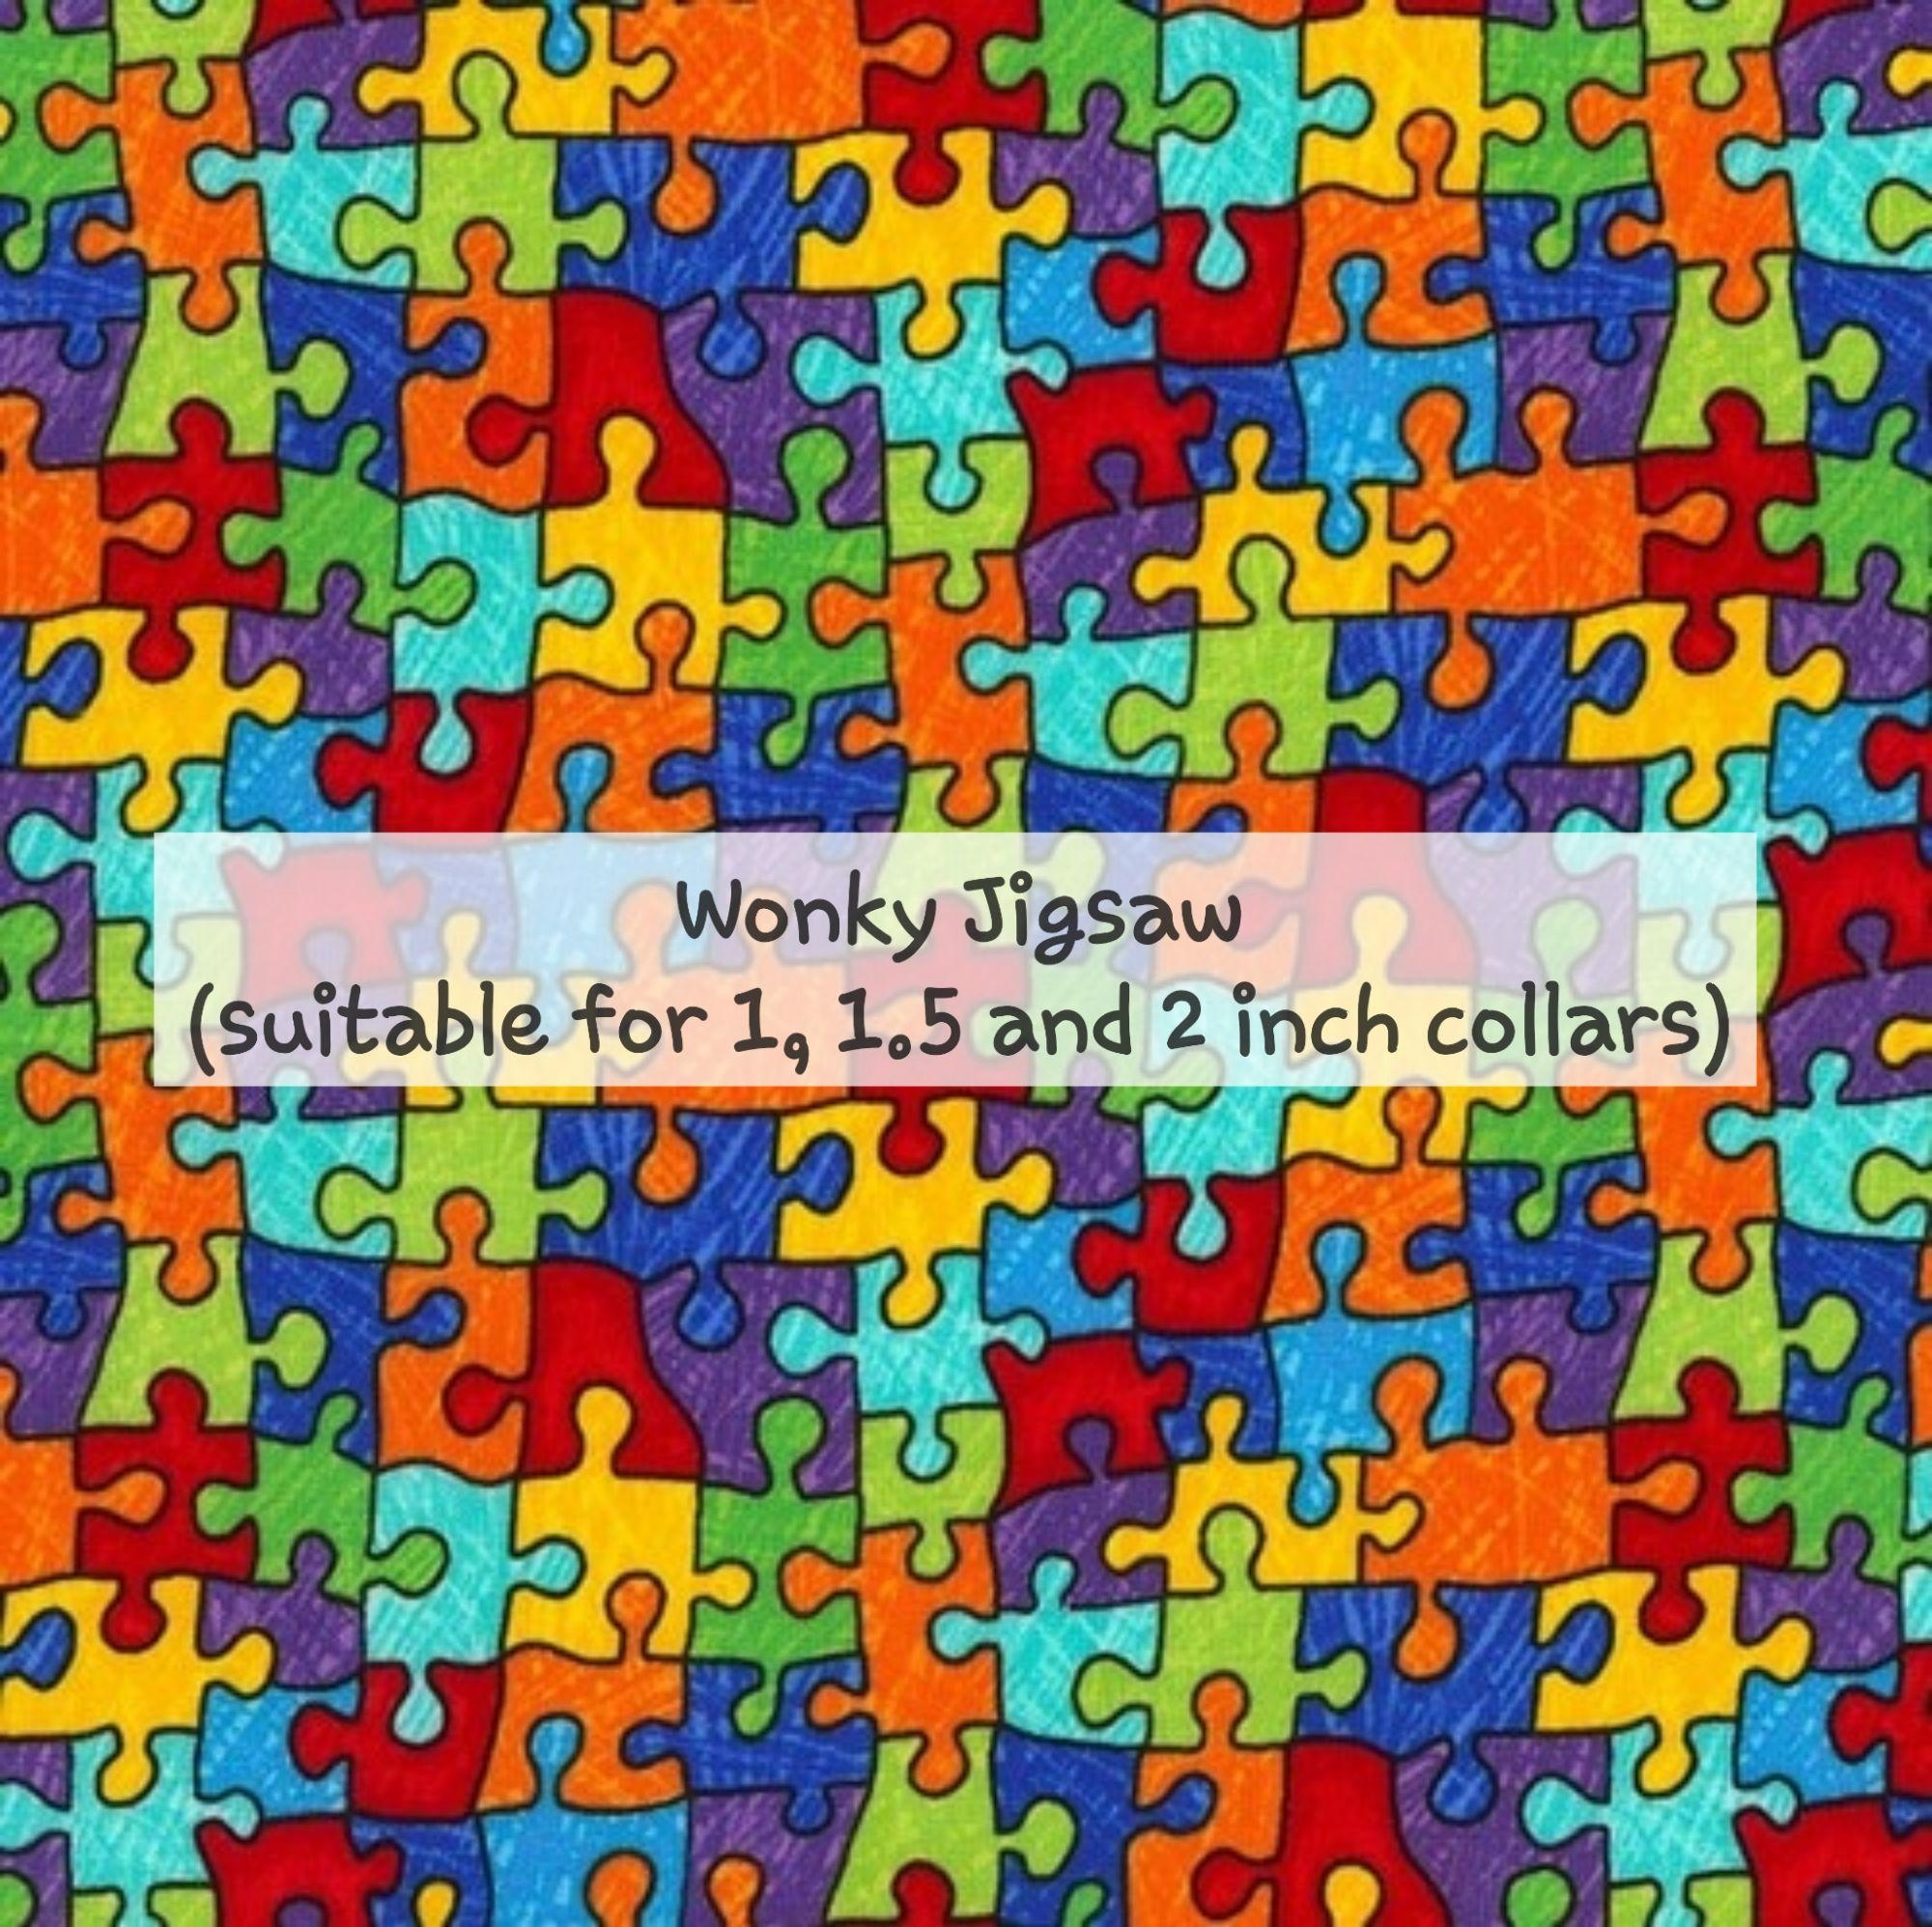 Wonky Jigsaw